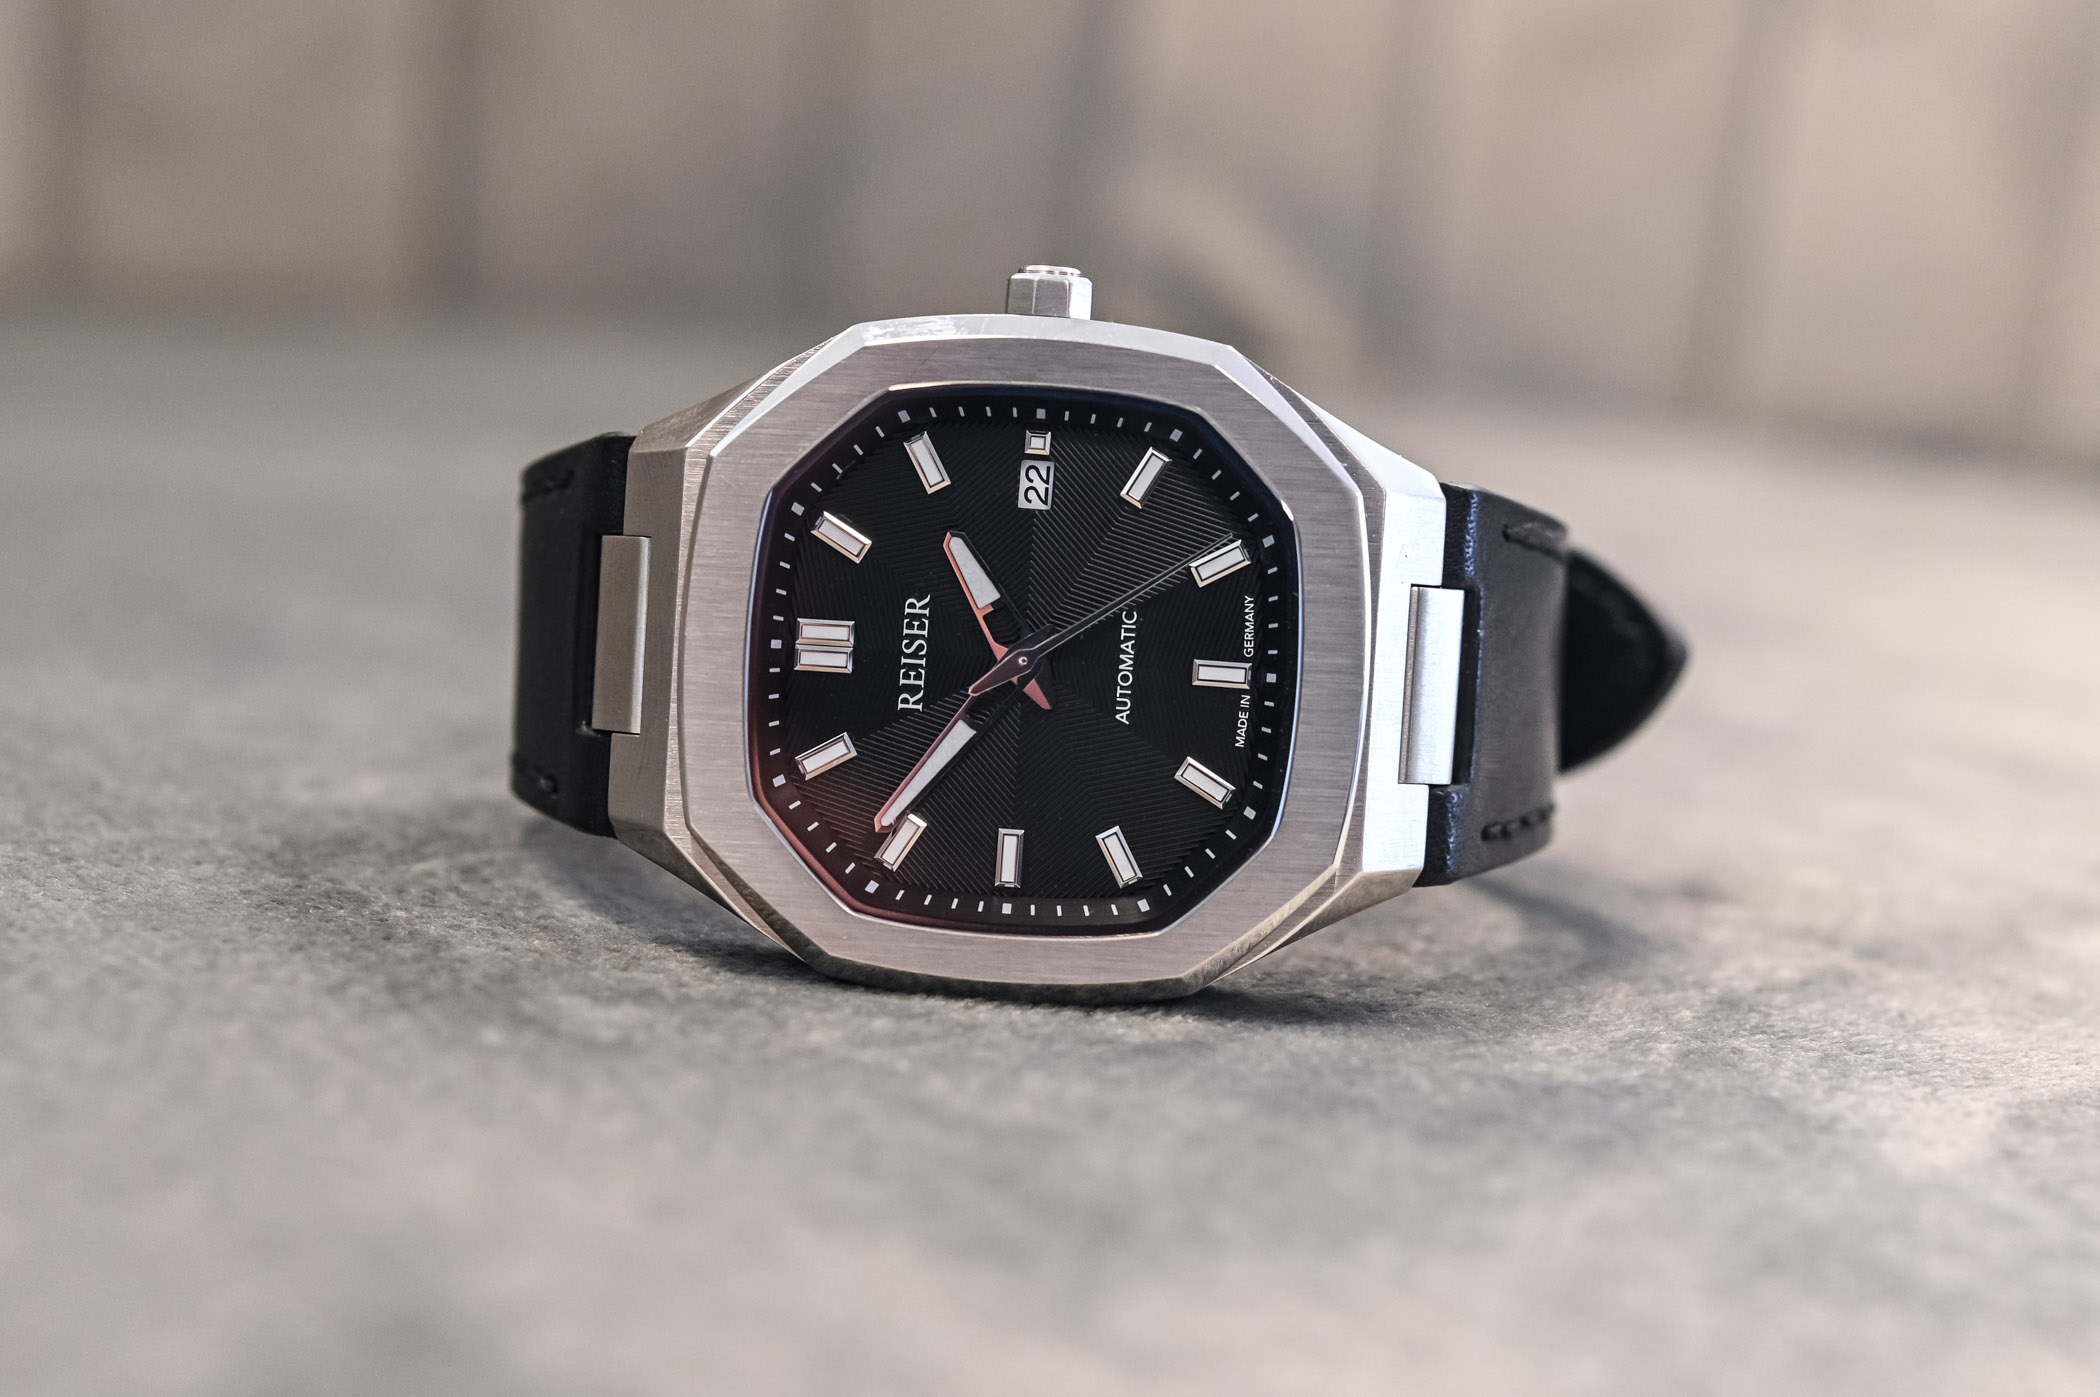 Reiser Alpen Date Watch - value proposition hands-on - 9